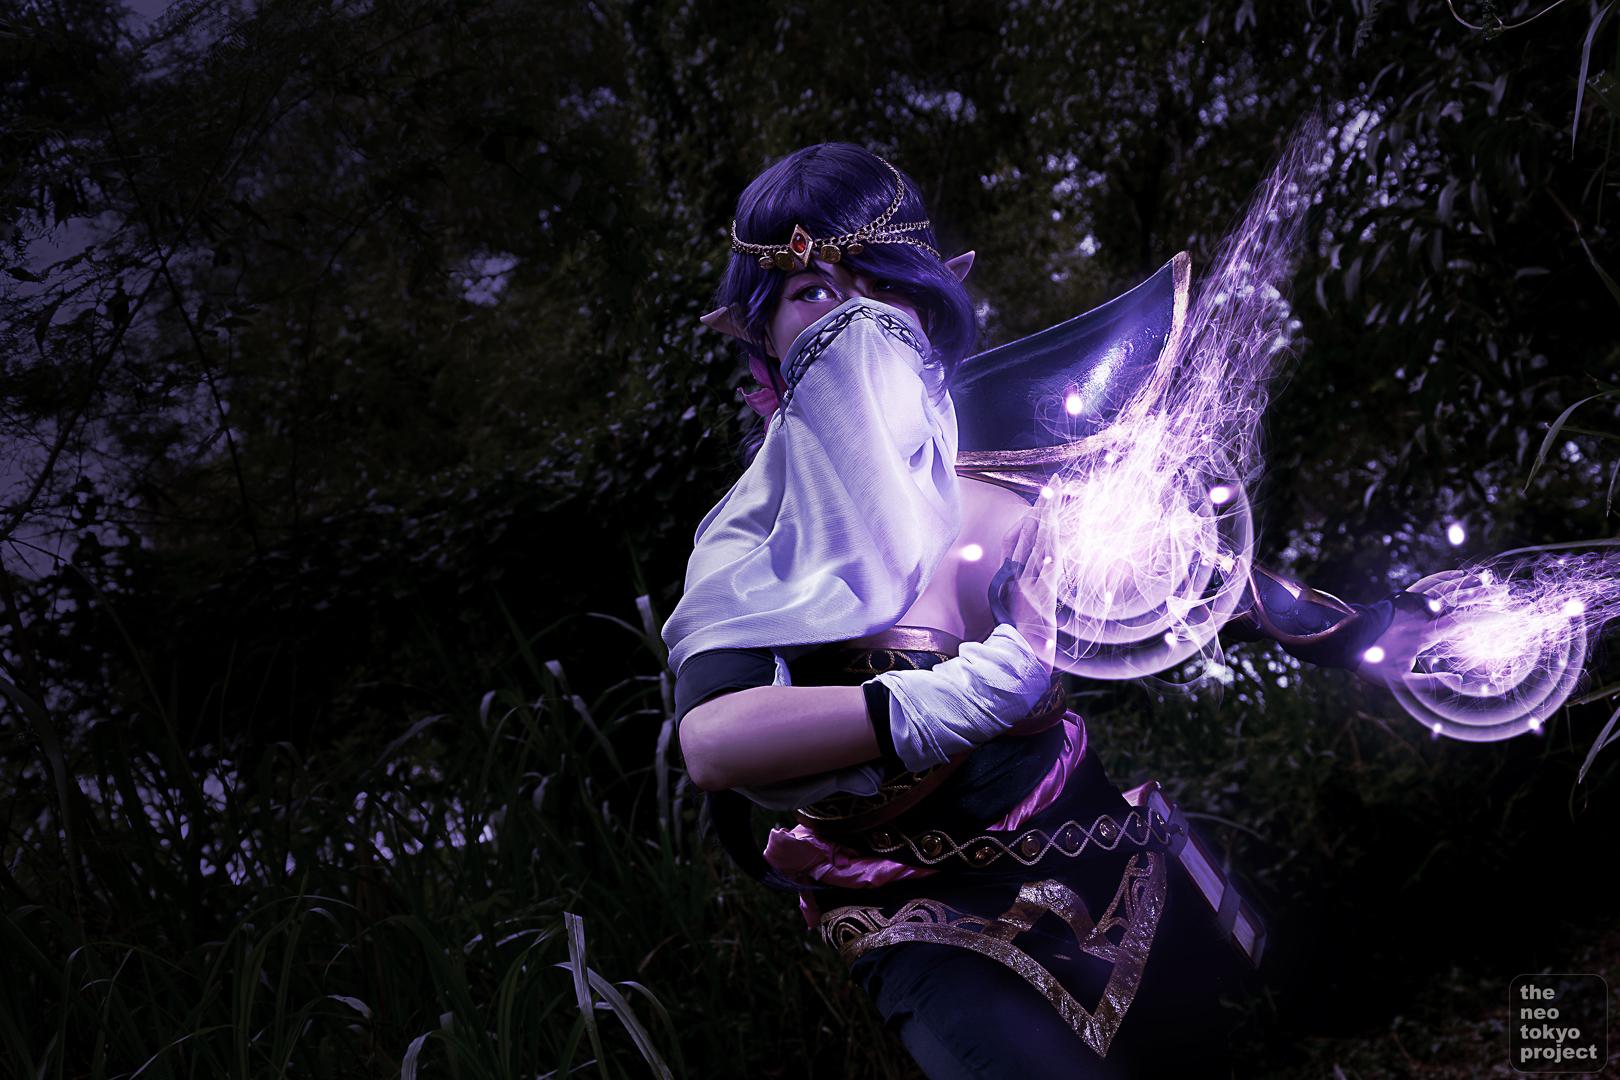 lanaya dota 2 cosplay - photo #14